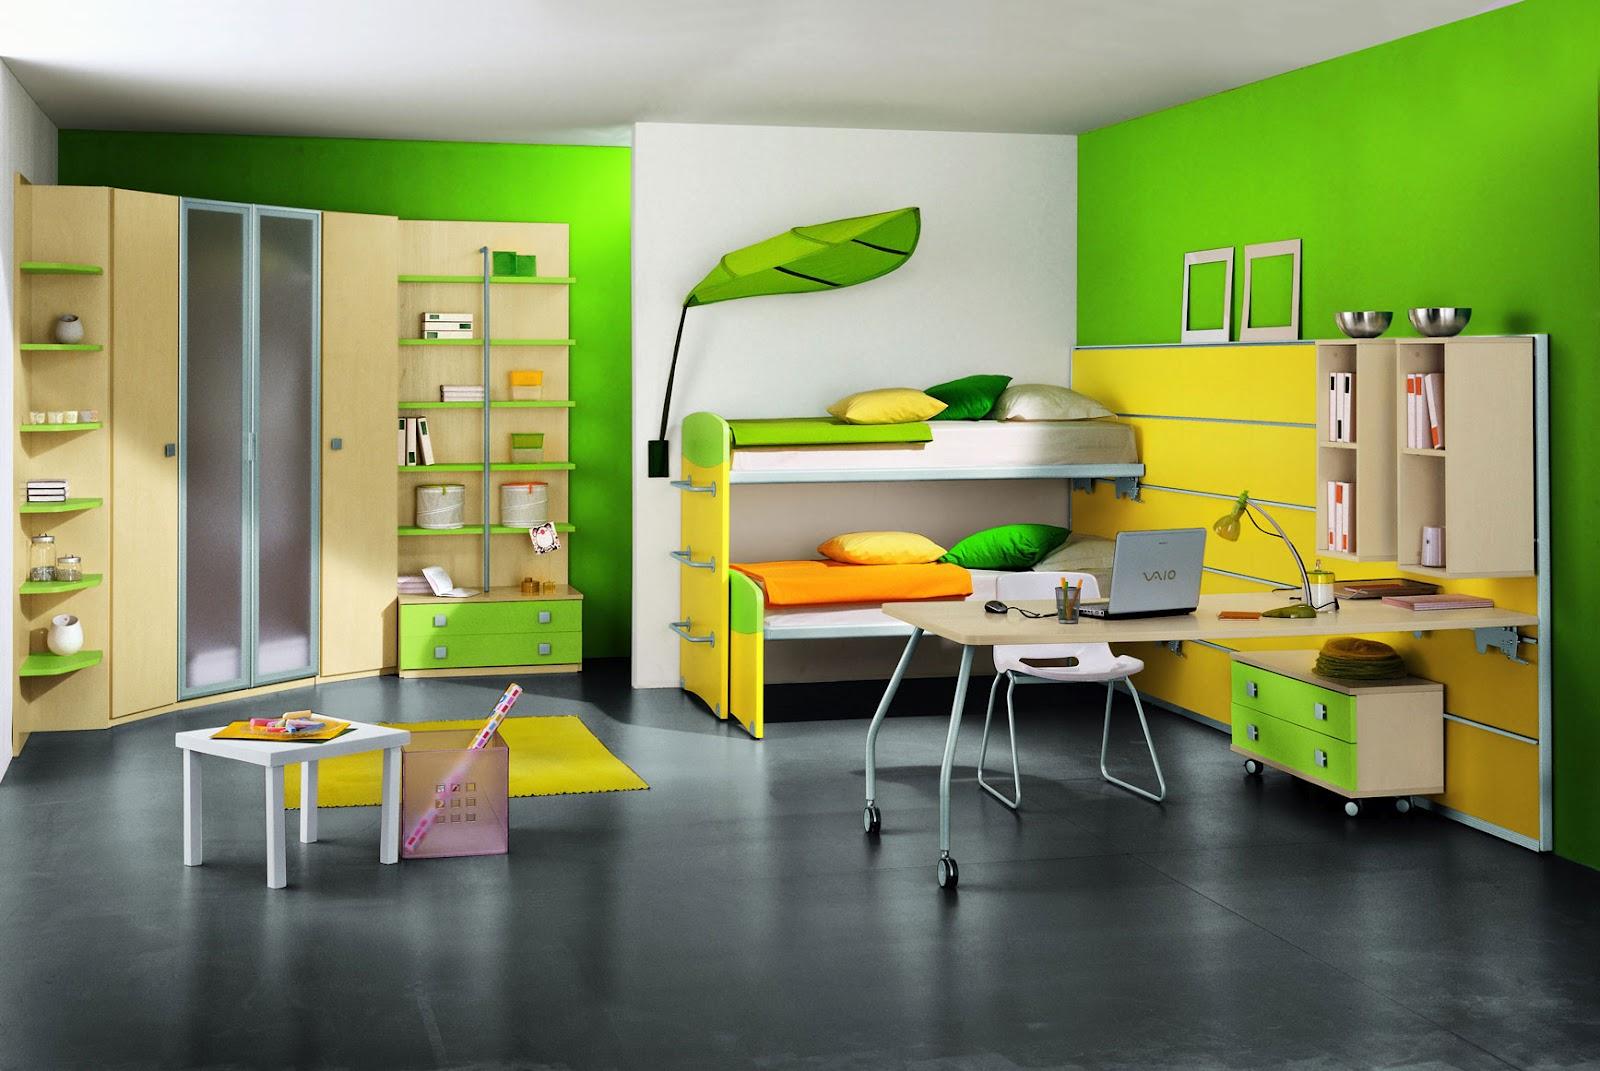 http://4.bp.blogspot.com/-_pihzMsYkO0/UCPH54c0DdI/AAAAAAAAAn4/EP2psvZnXuM/s1600/Kids+Bedroom+Accessories+Idea+Design.jpg